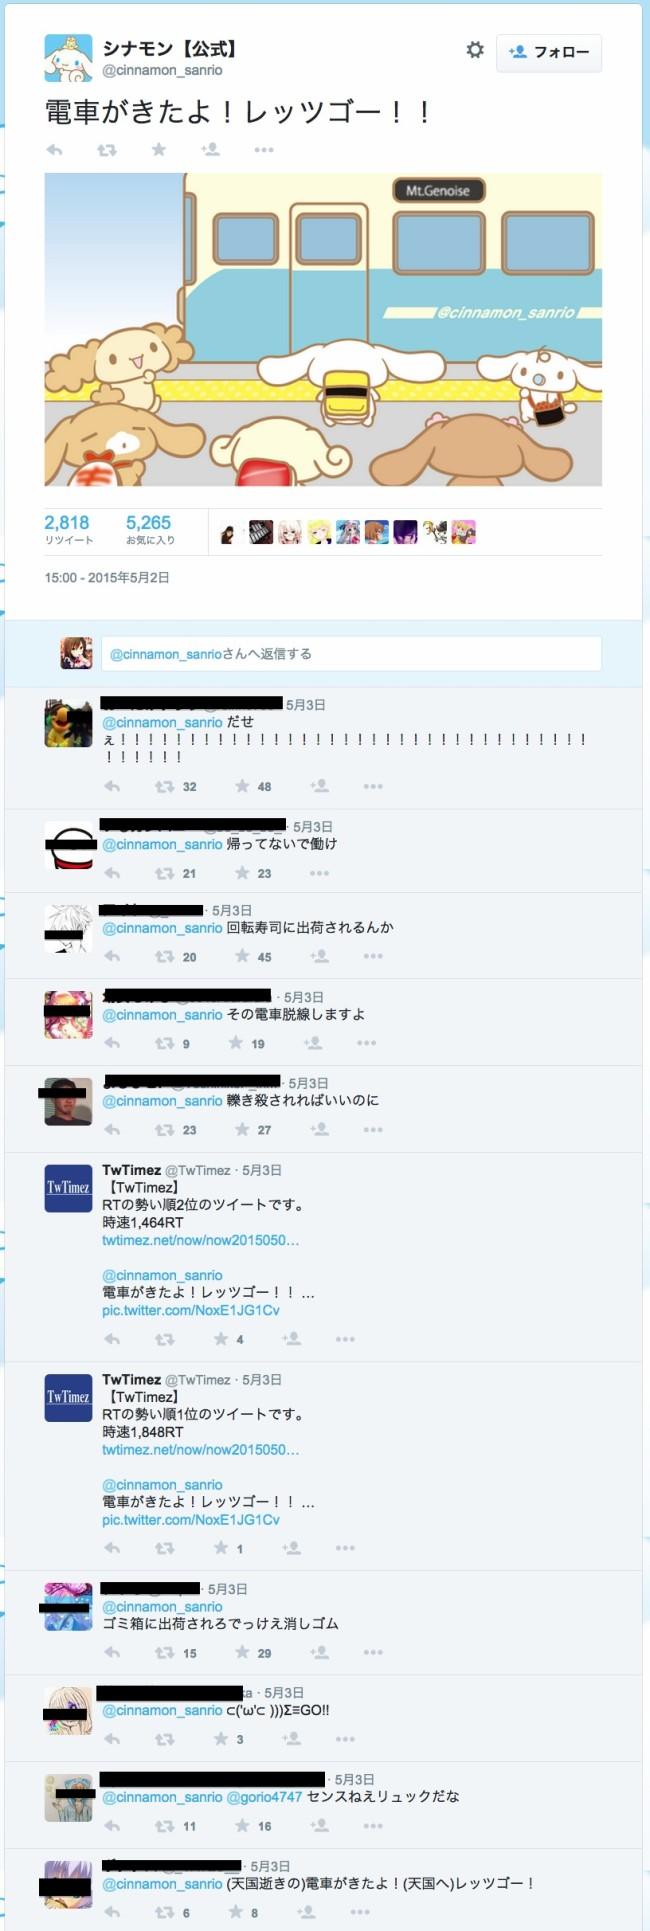 screencapture-twitter-com-cinnamon_sanrio-status-594667715039600641-1431651522521 のコピー